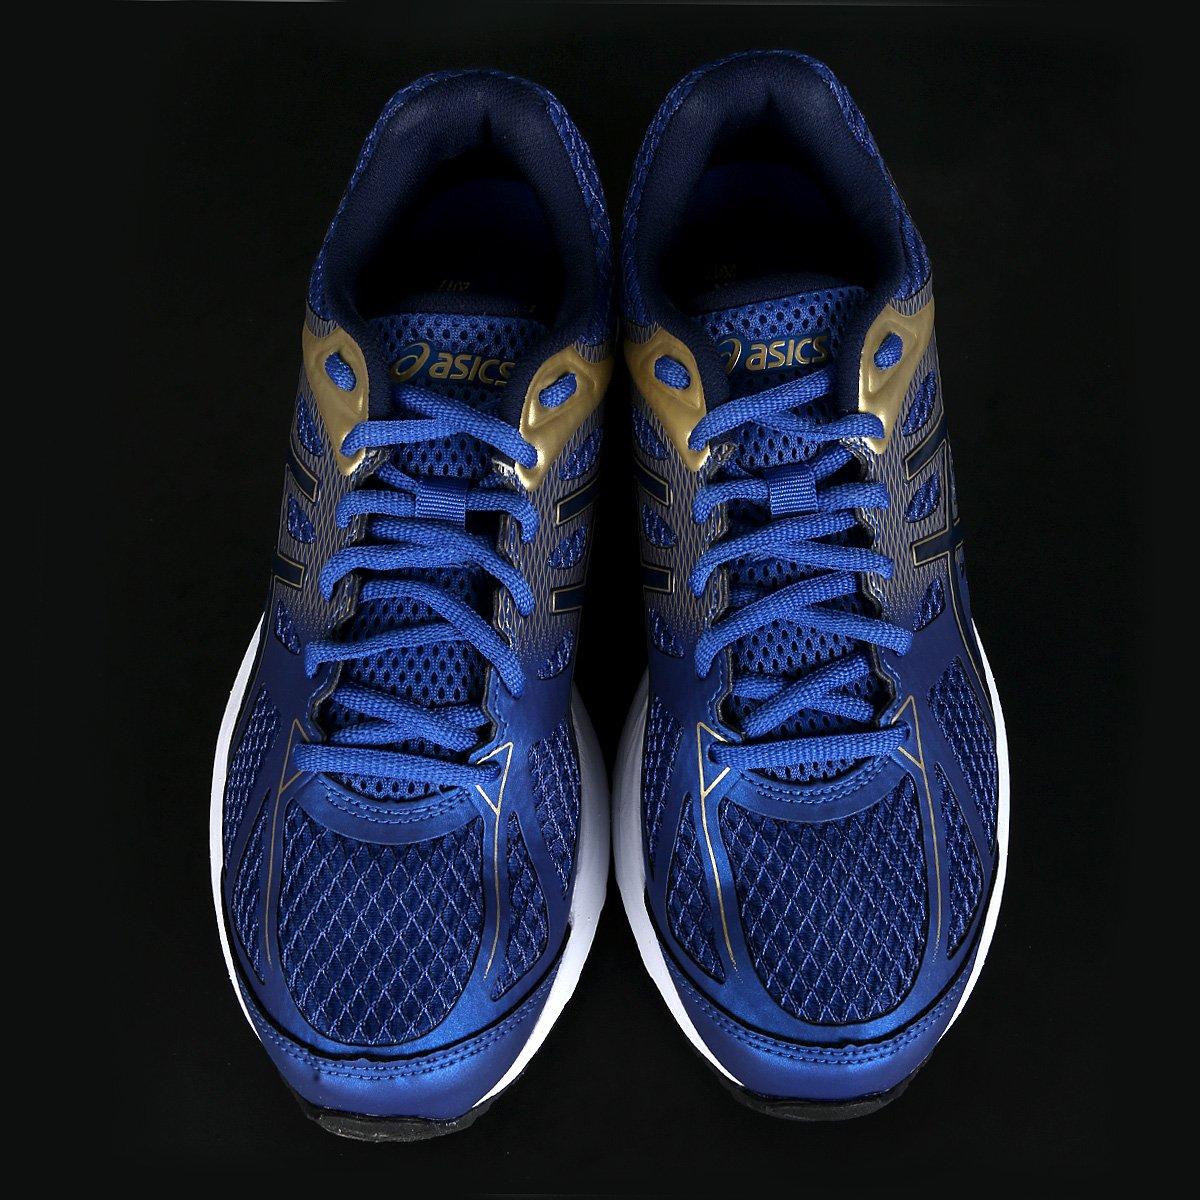 Tênis Asics Gel-Spree Masculino - Compre Agora Netshoes 8722974f520597 ... 70c5831d10d3f